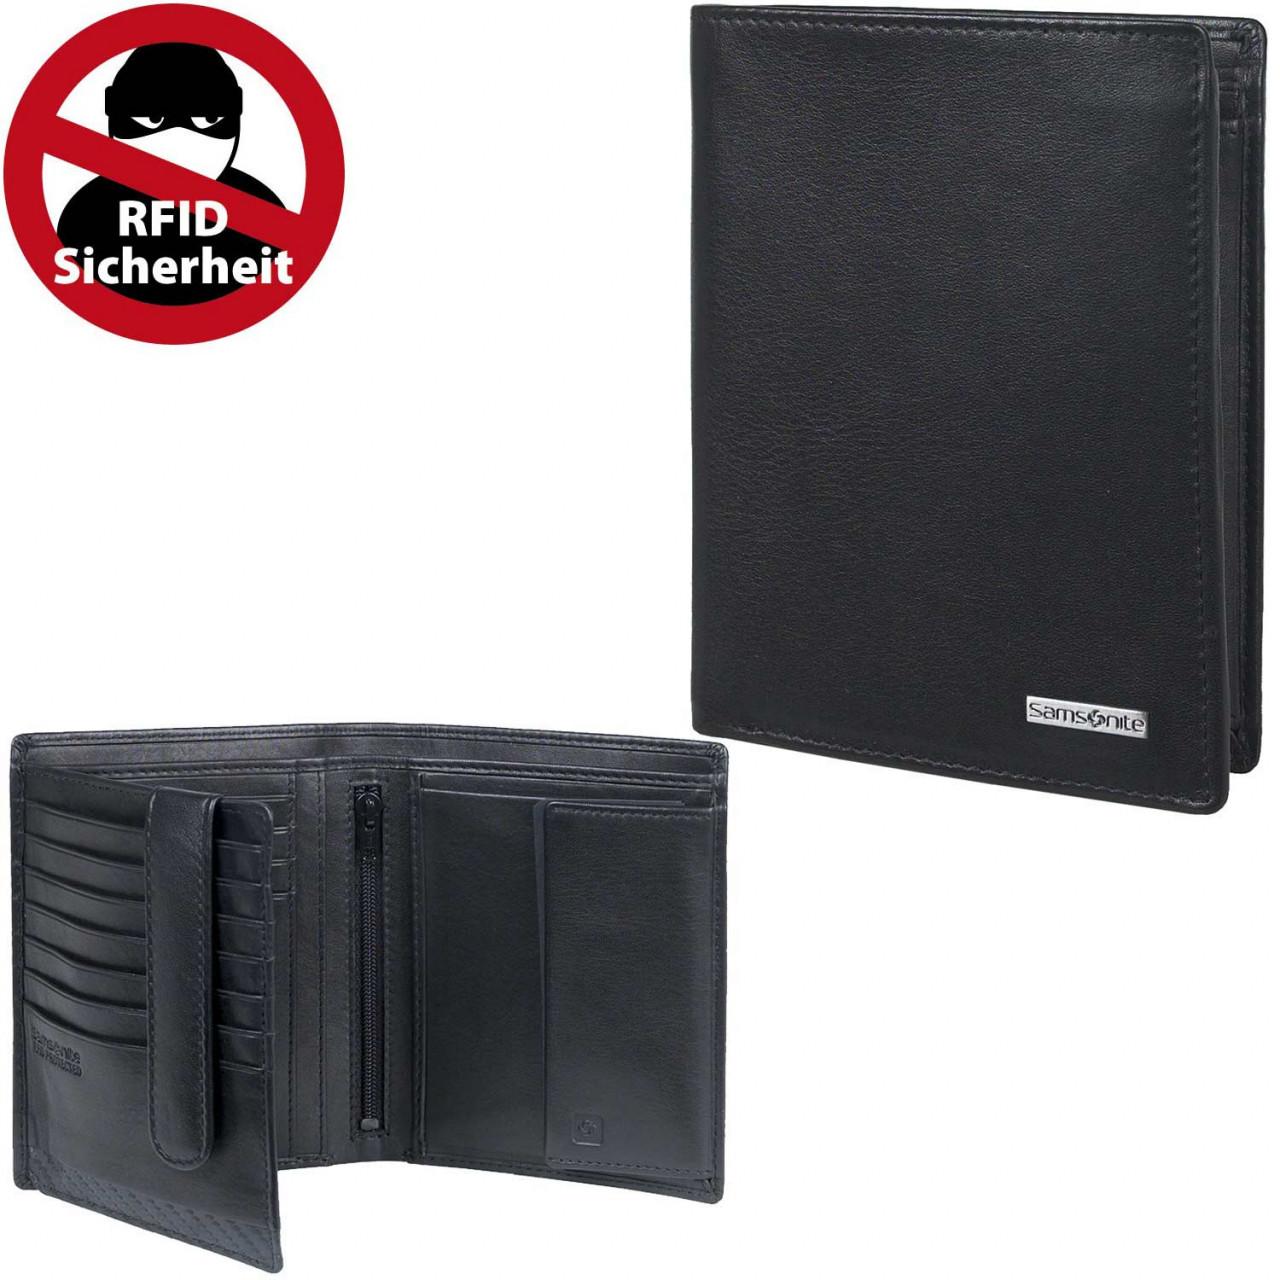 Samsonite Hochformatbörse S-Derry SLG black